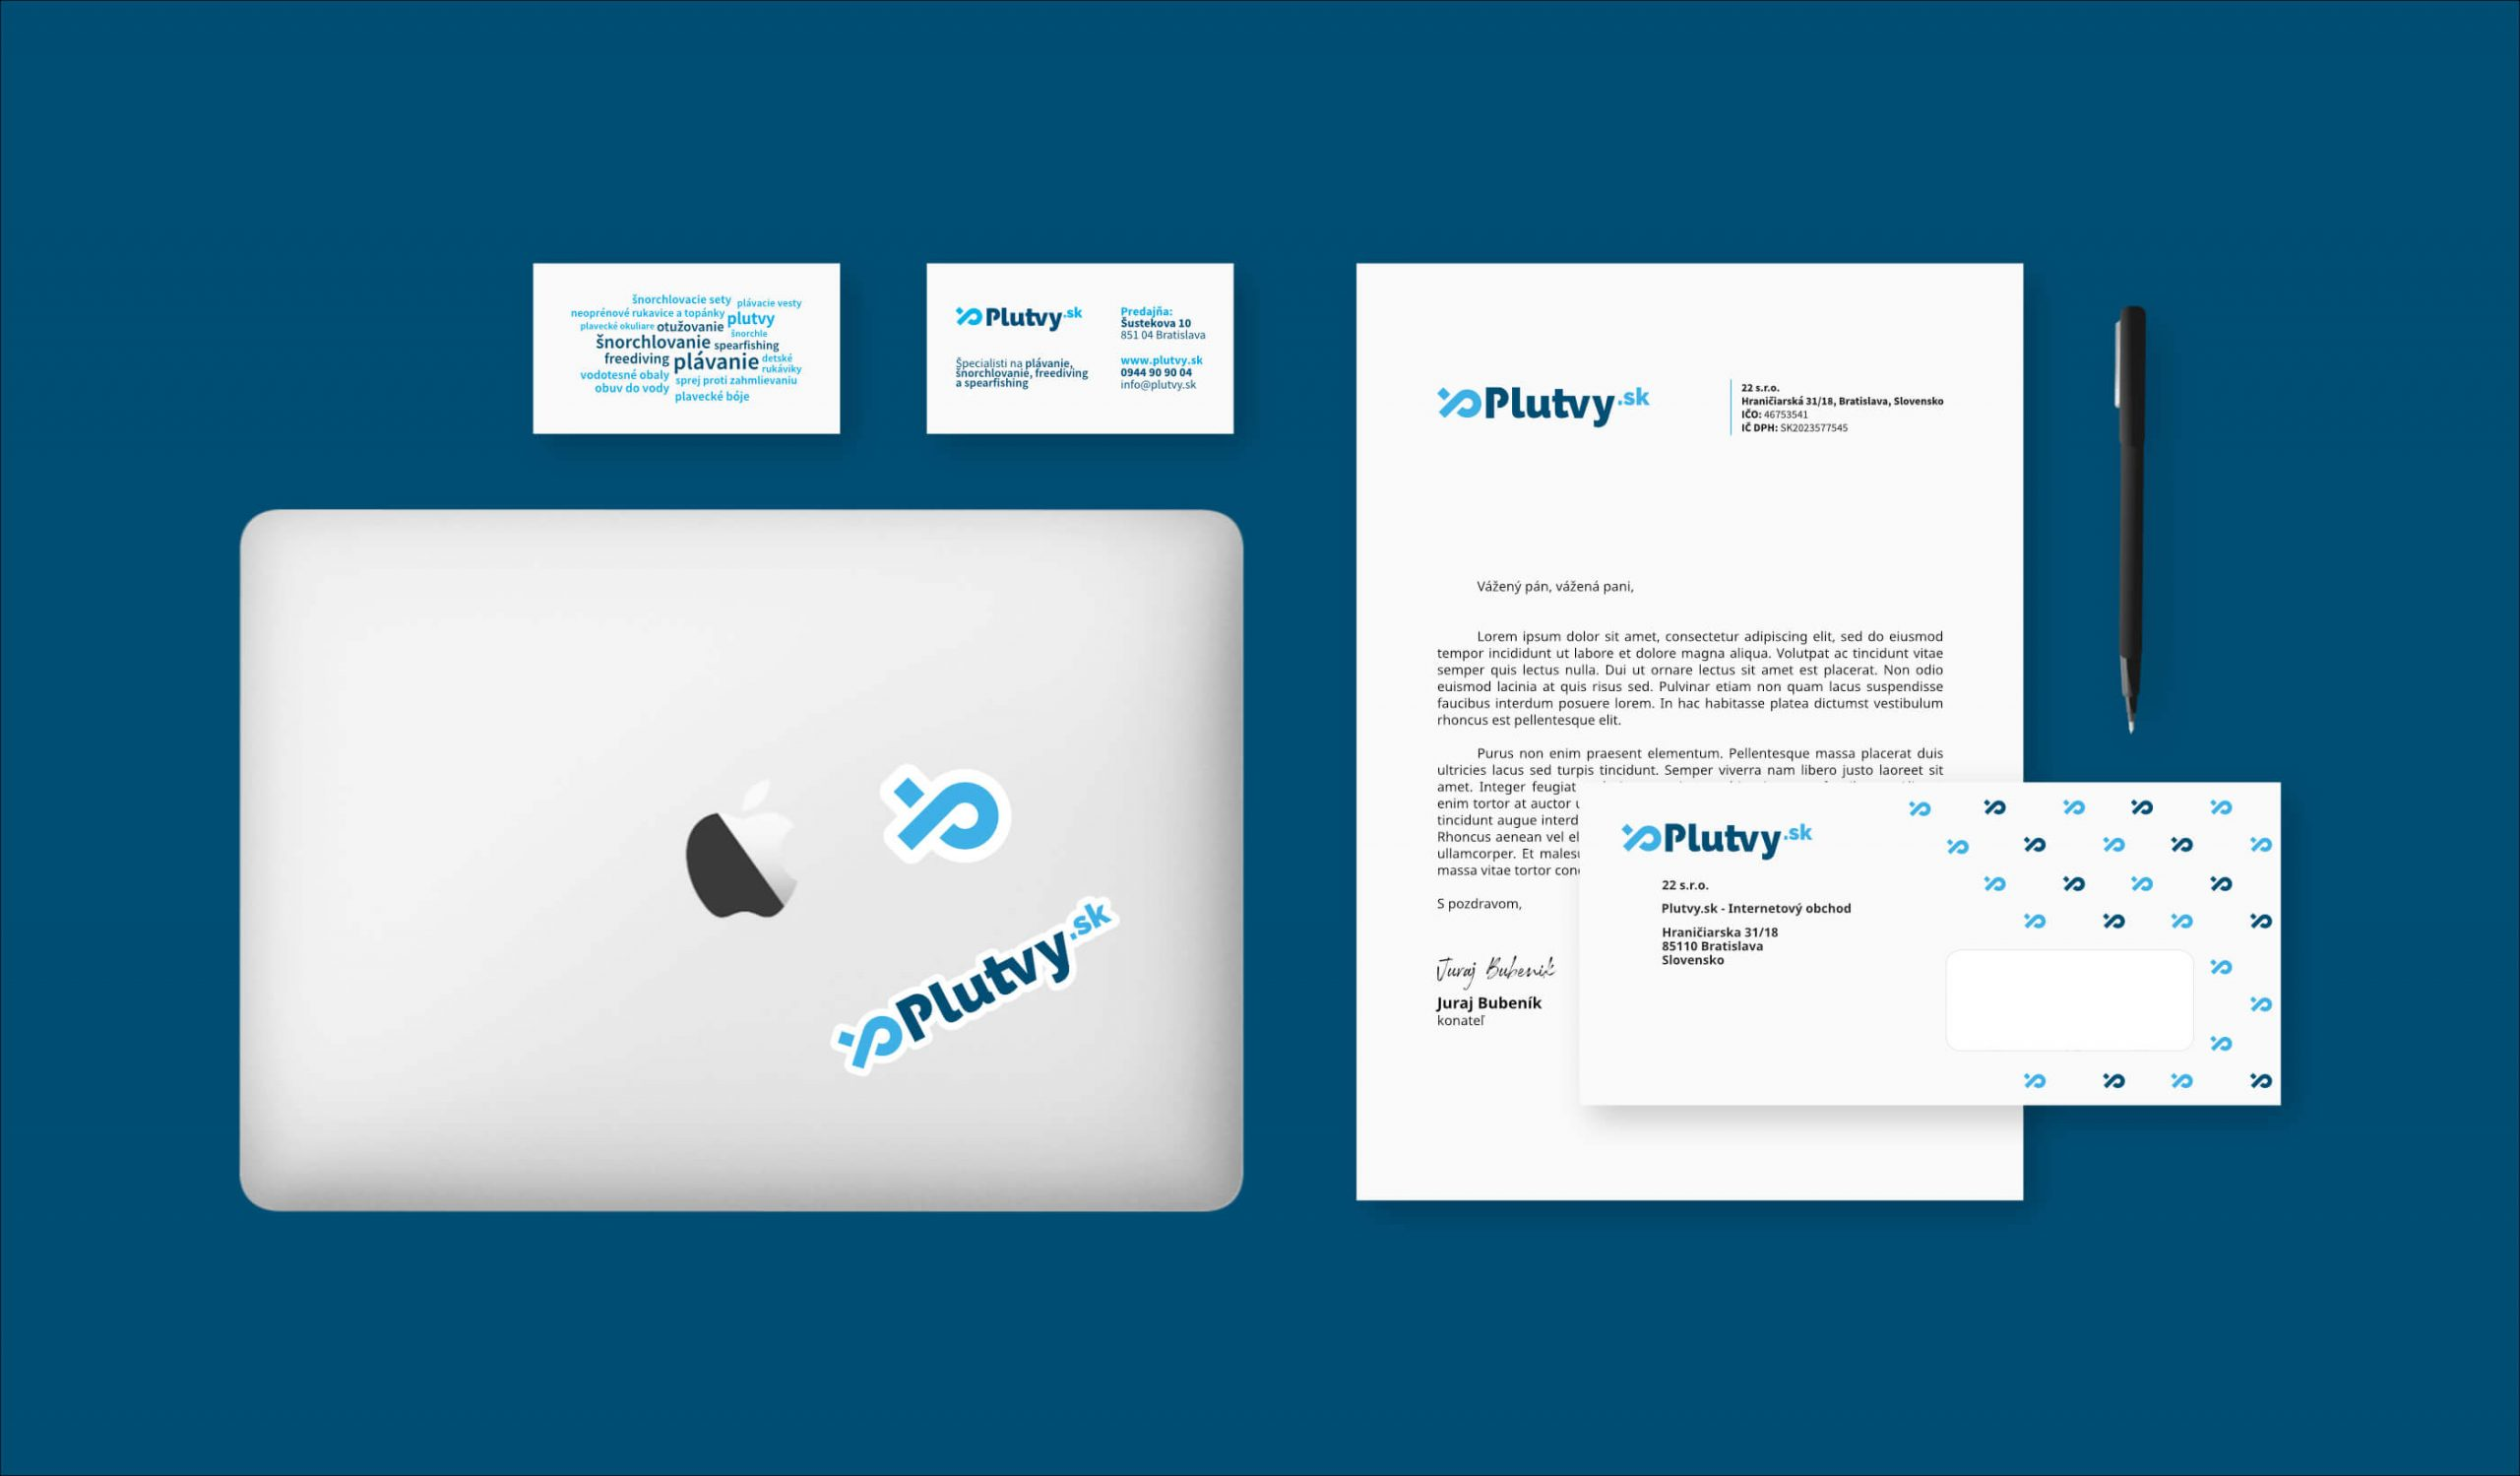 plutvy-sk final logo branding stationery by michael maleek djibril